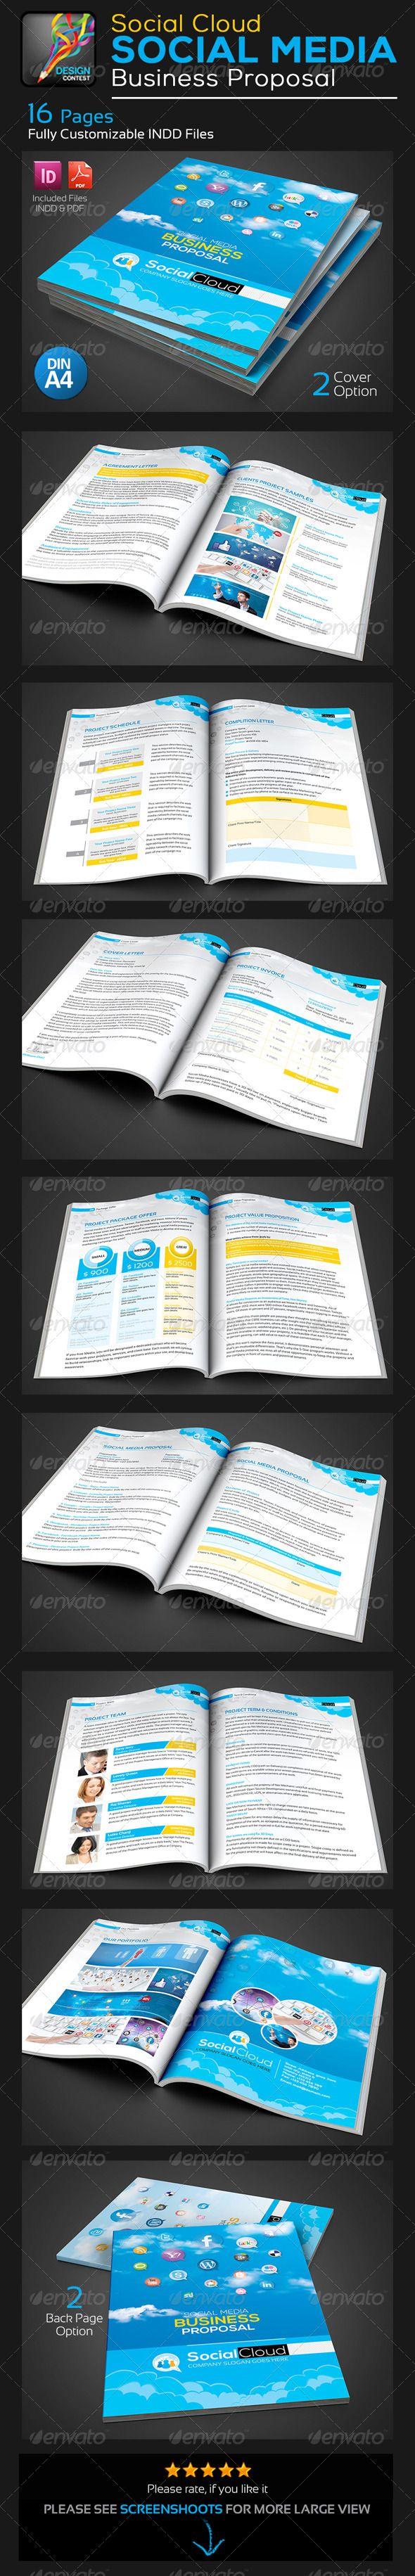 Social Cloud Social Media Business Proposal Indesign Indd